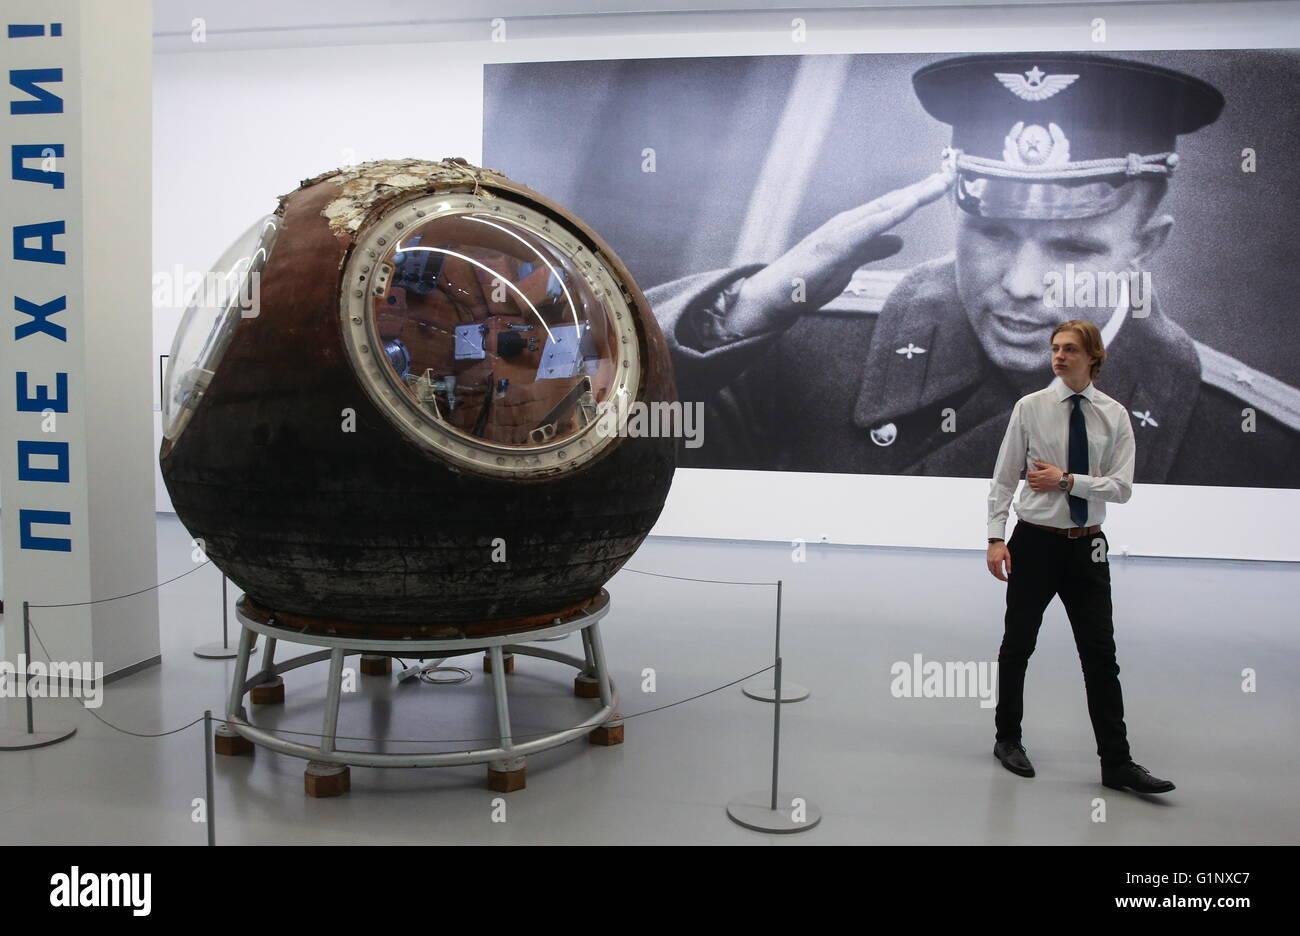 Vostok 1 yuri gagarin